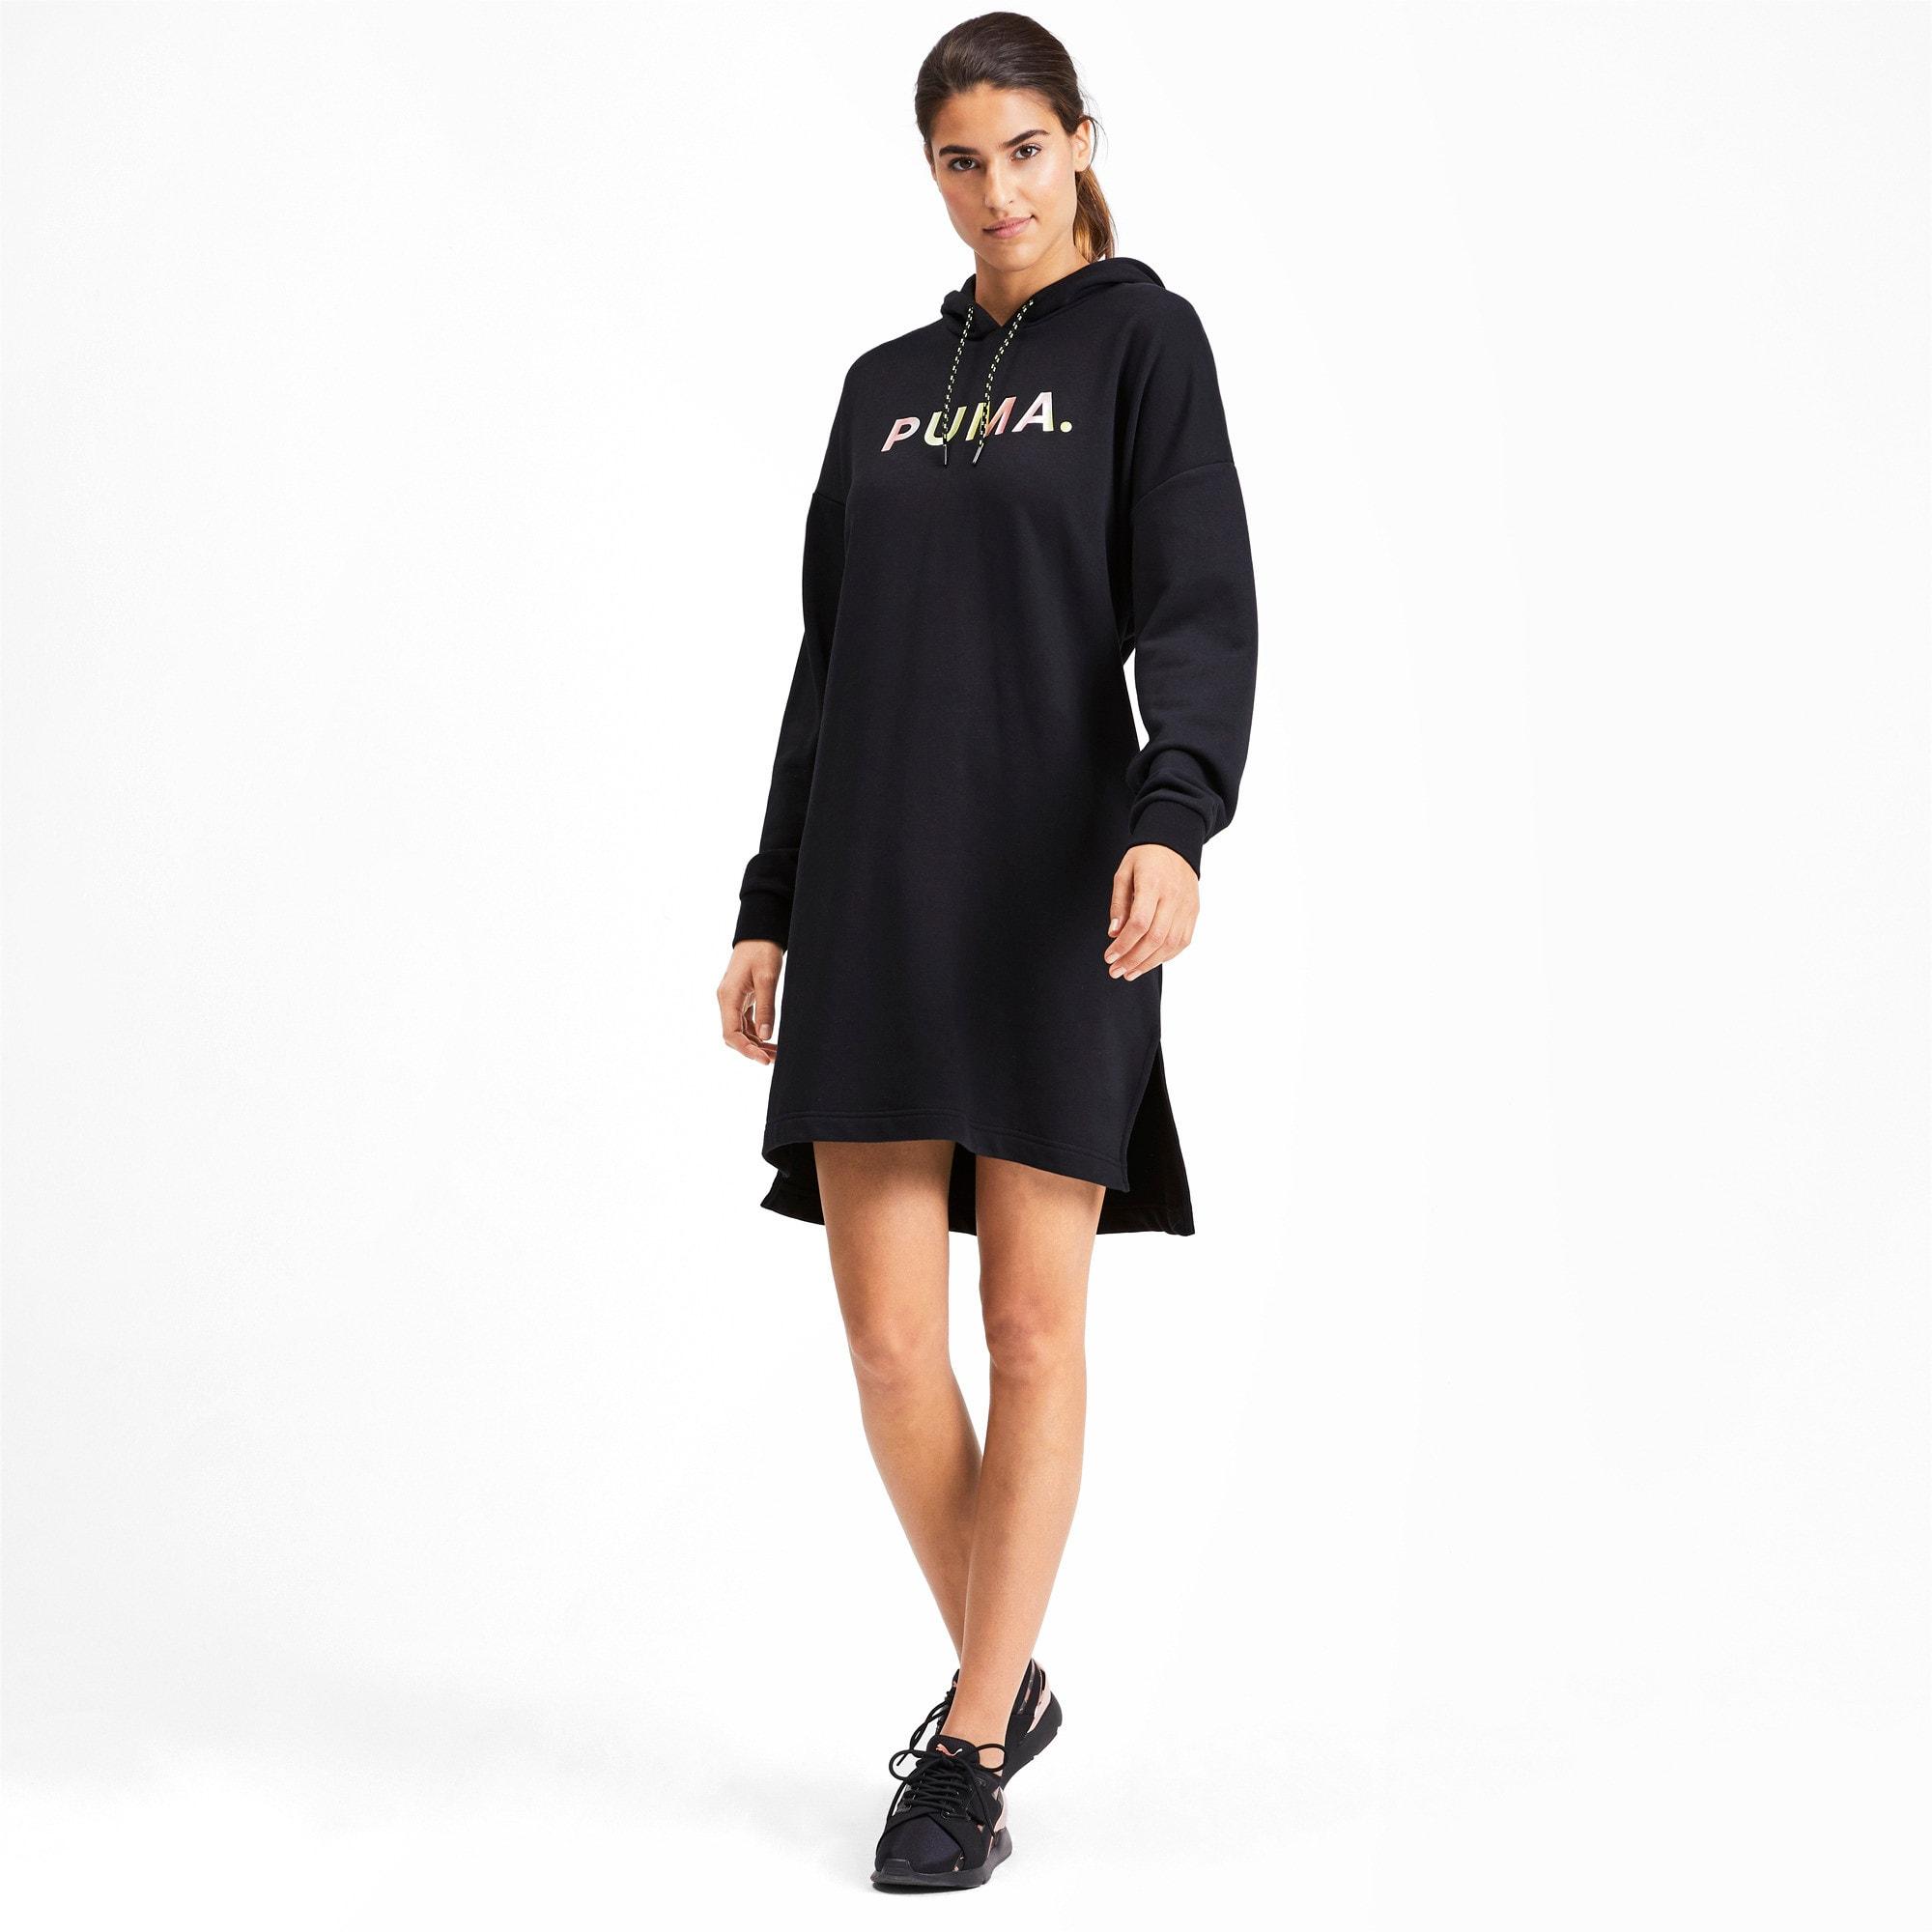 Thumbnail 3 of Chase Hooded Women's Dress, Puma Black, medium